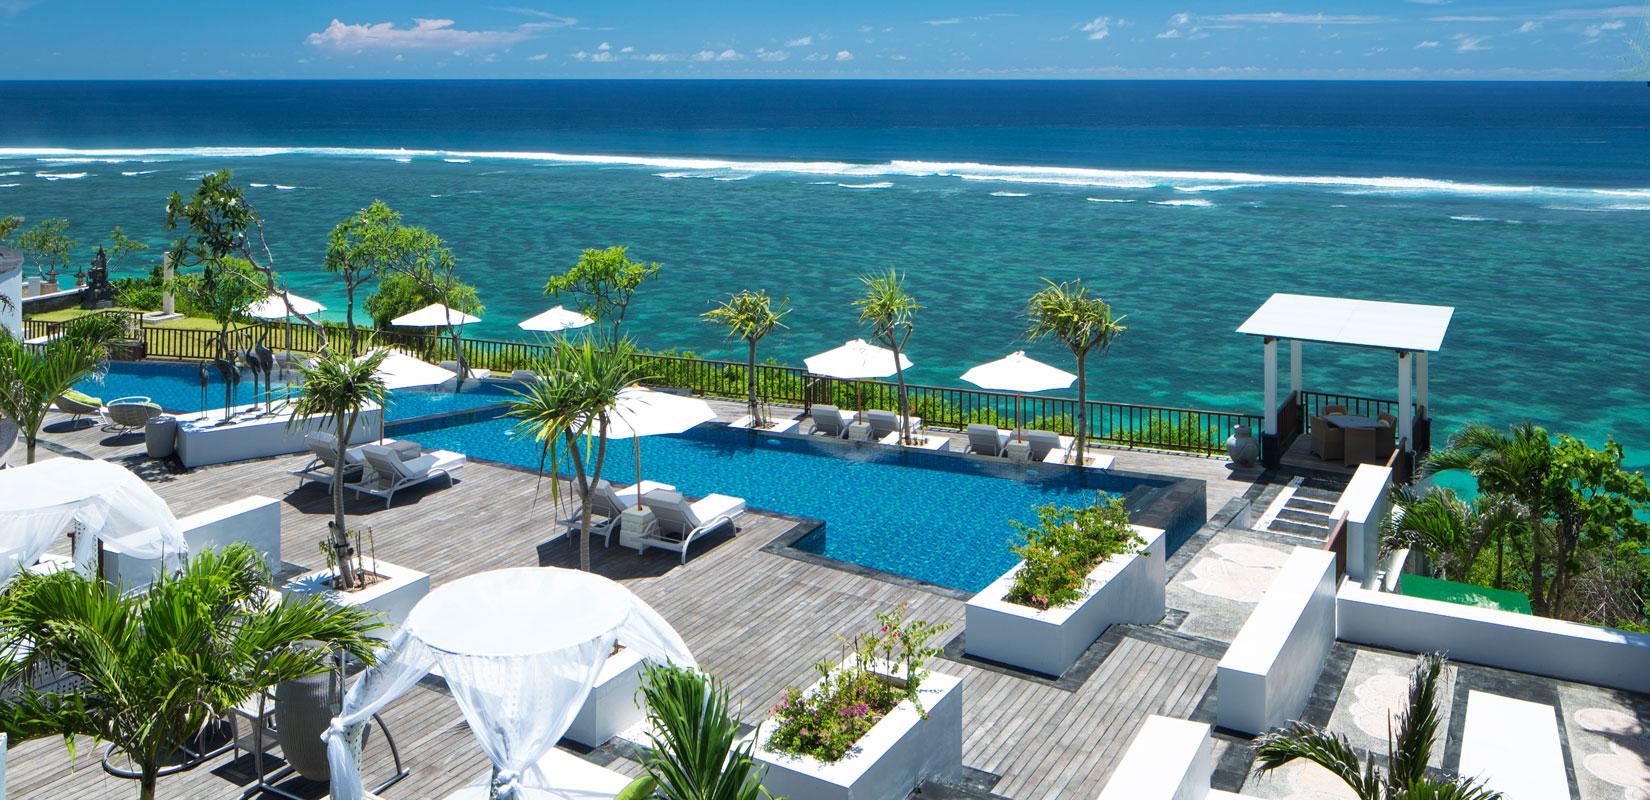 Samabe bali resort villas luxury all inclusive the for Amazing all inclusive deals